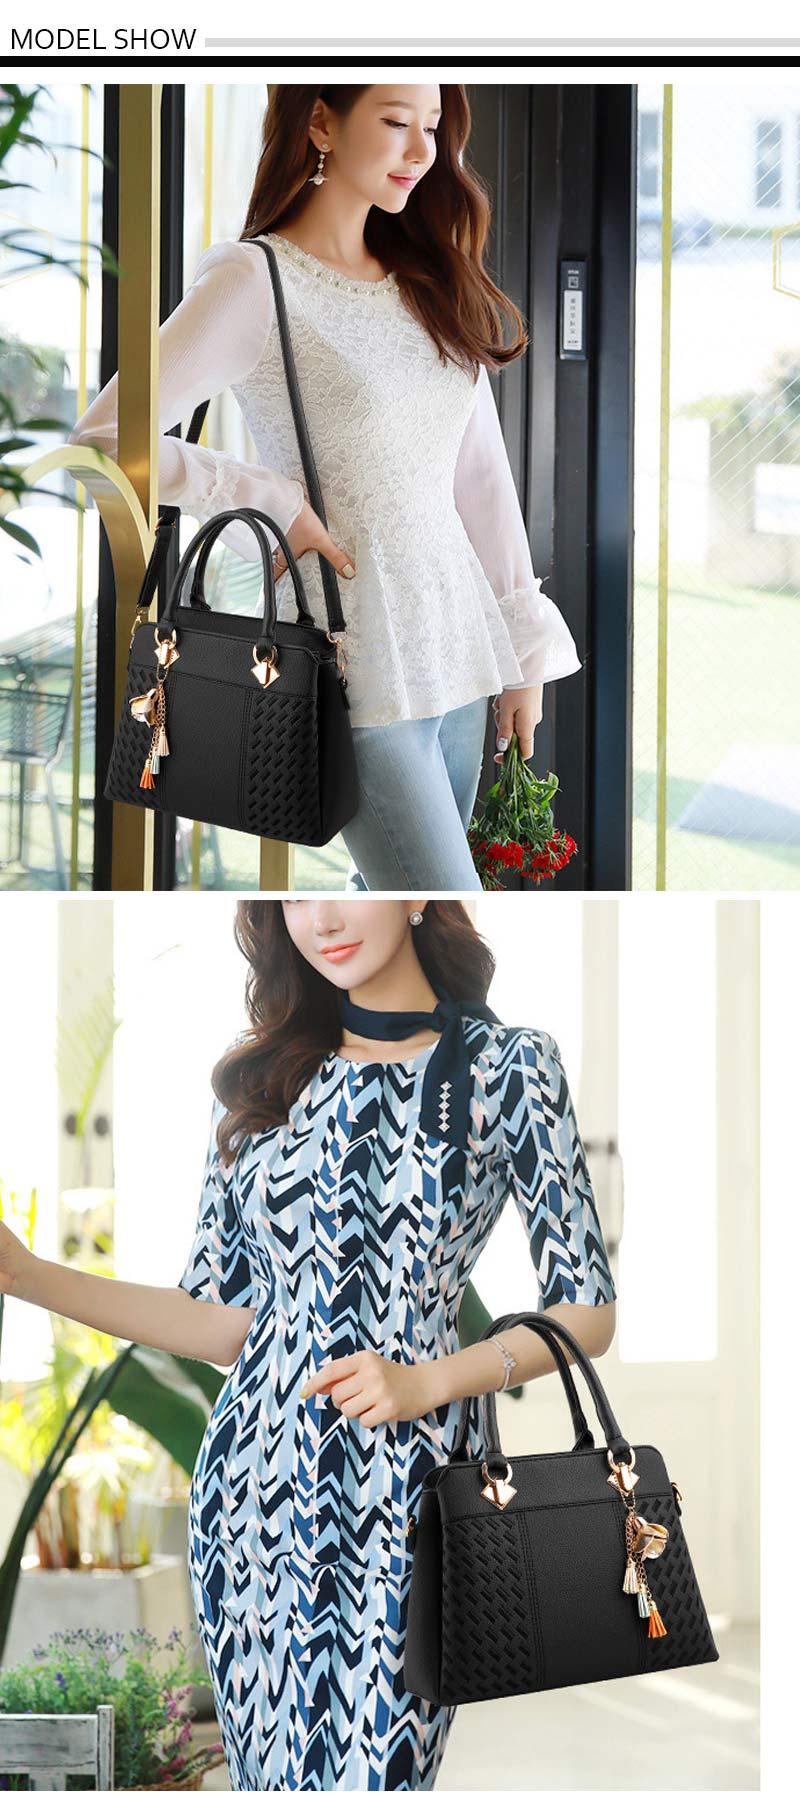 STSR Leather Clutch Bag Female Handbag Luxury Beach Tote Ms. Fringe Shoulder Bag Tote gray one size 20